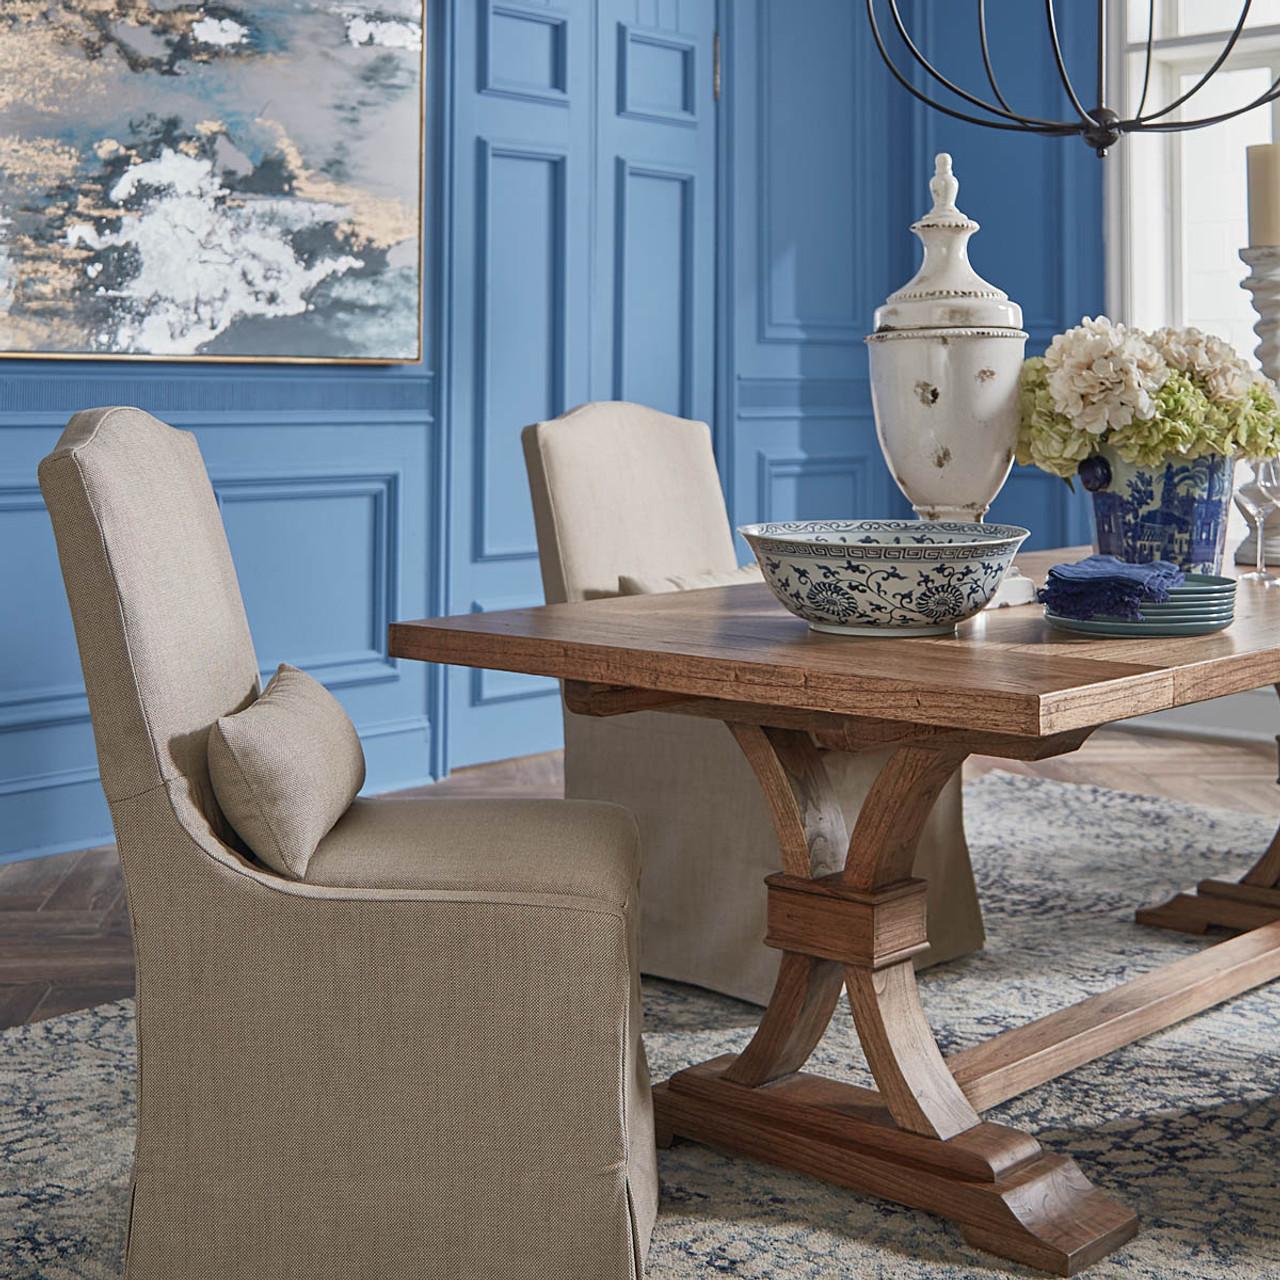 Tuscan Dining Table 240cm Mindi White Cedar Rustic Furniture